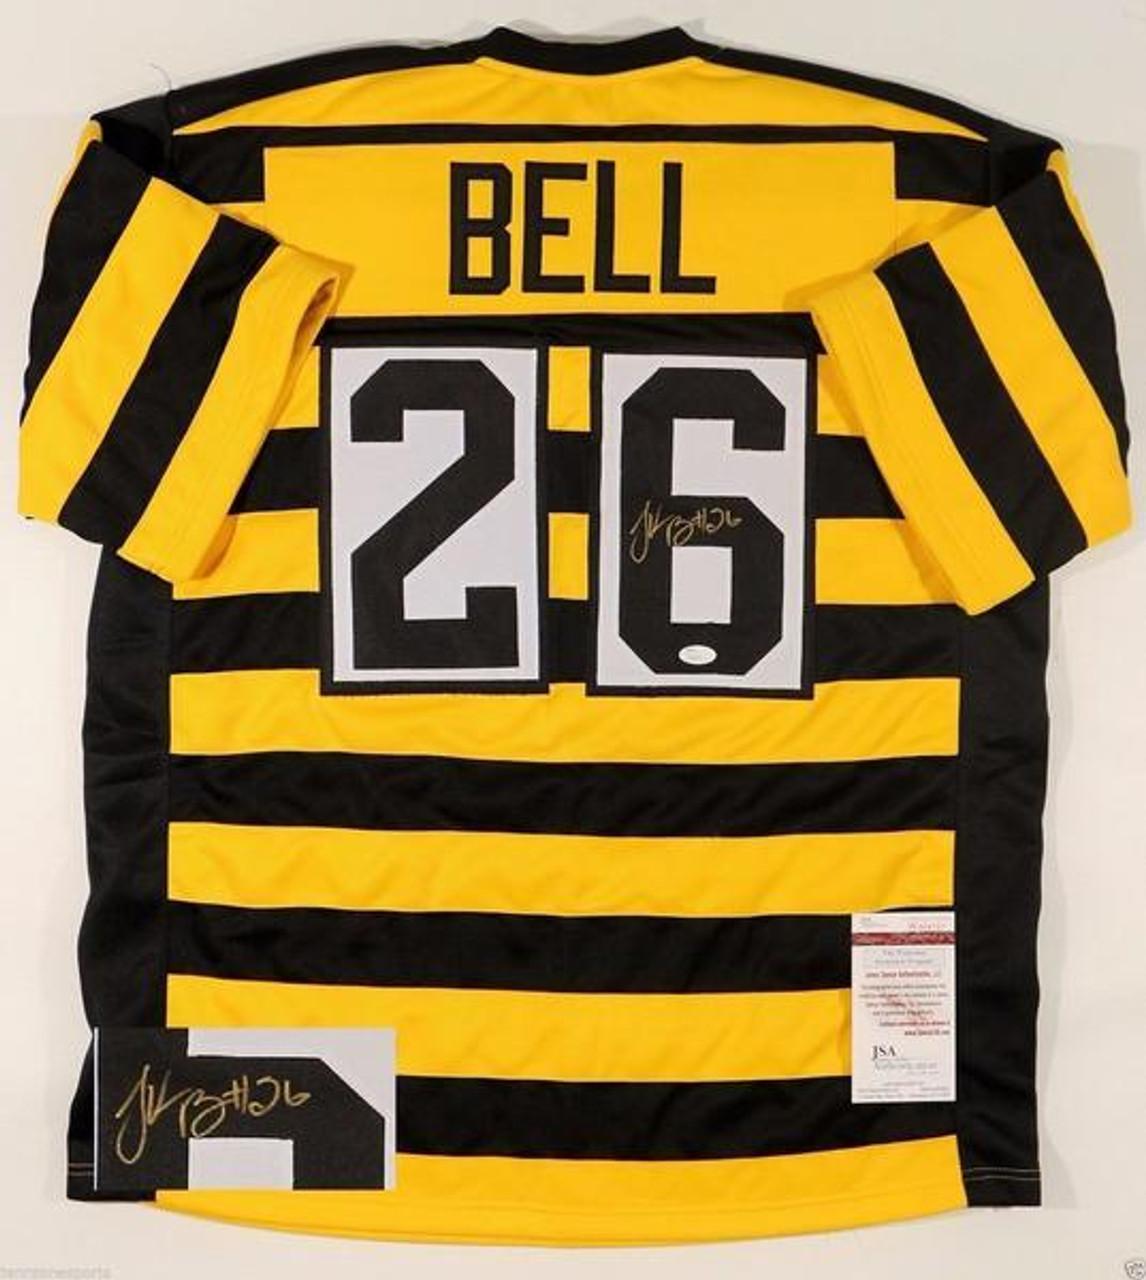 pittsburgh steelers bumblebee jersey